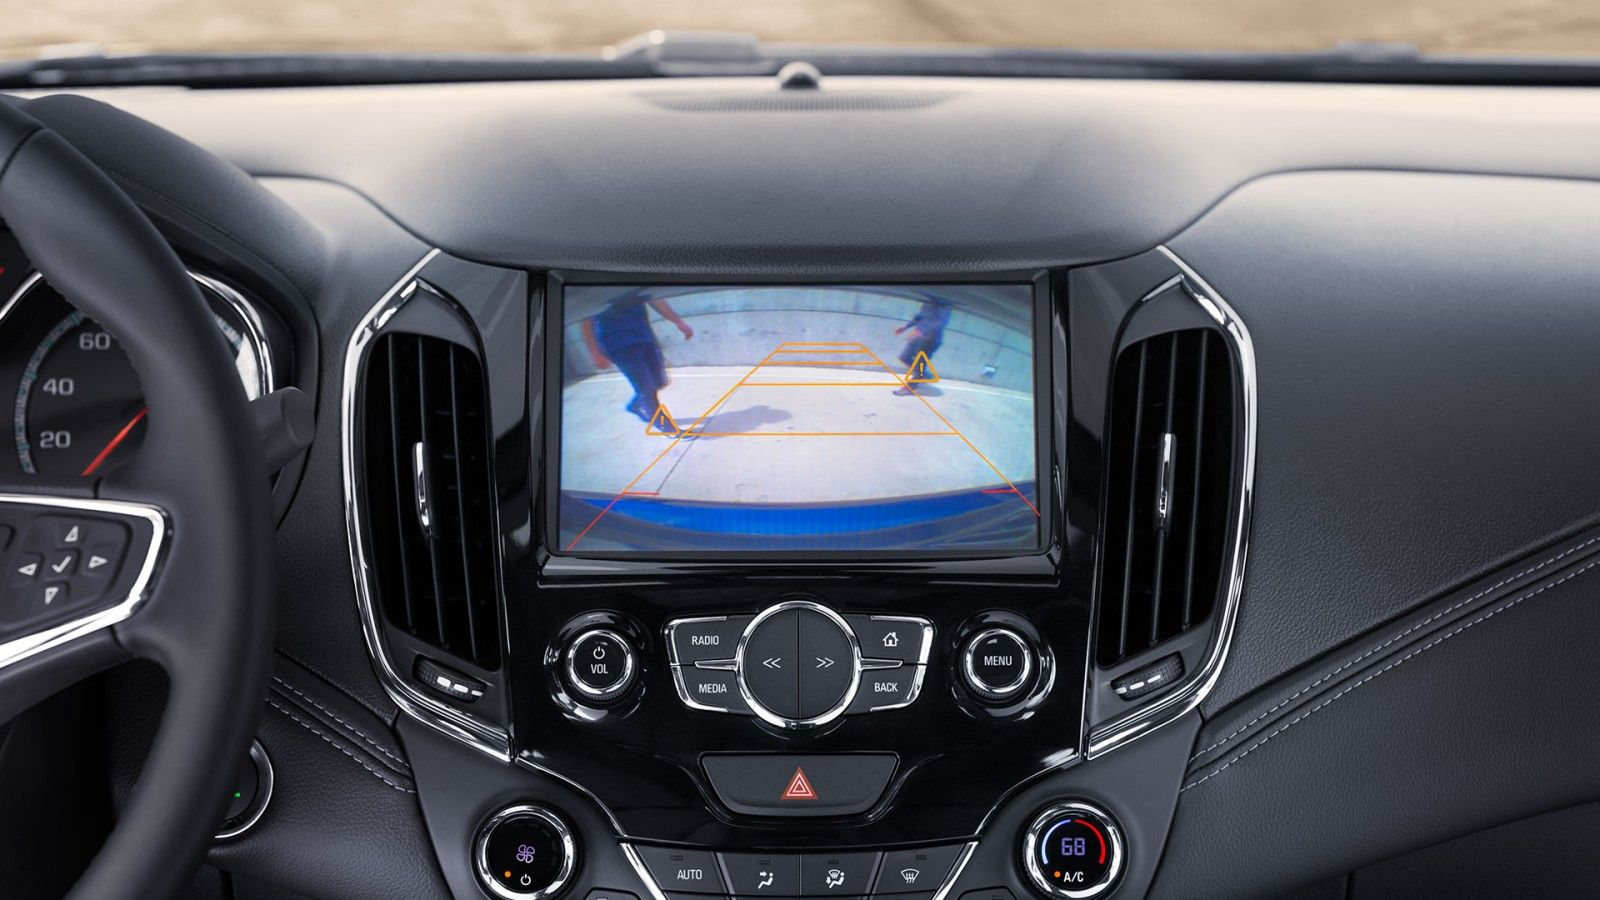 2017 Cruze Compact Car Interior touchscreen display